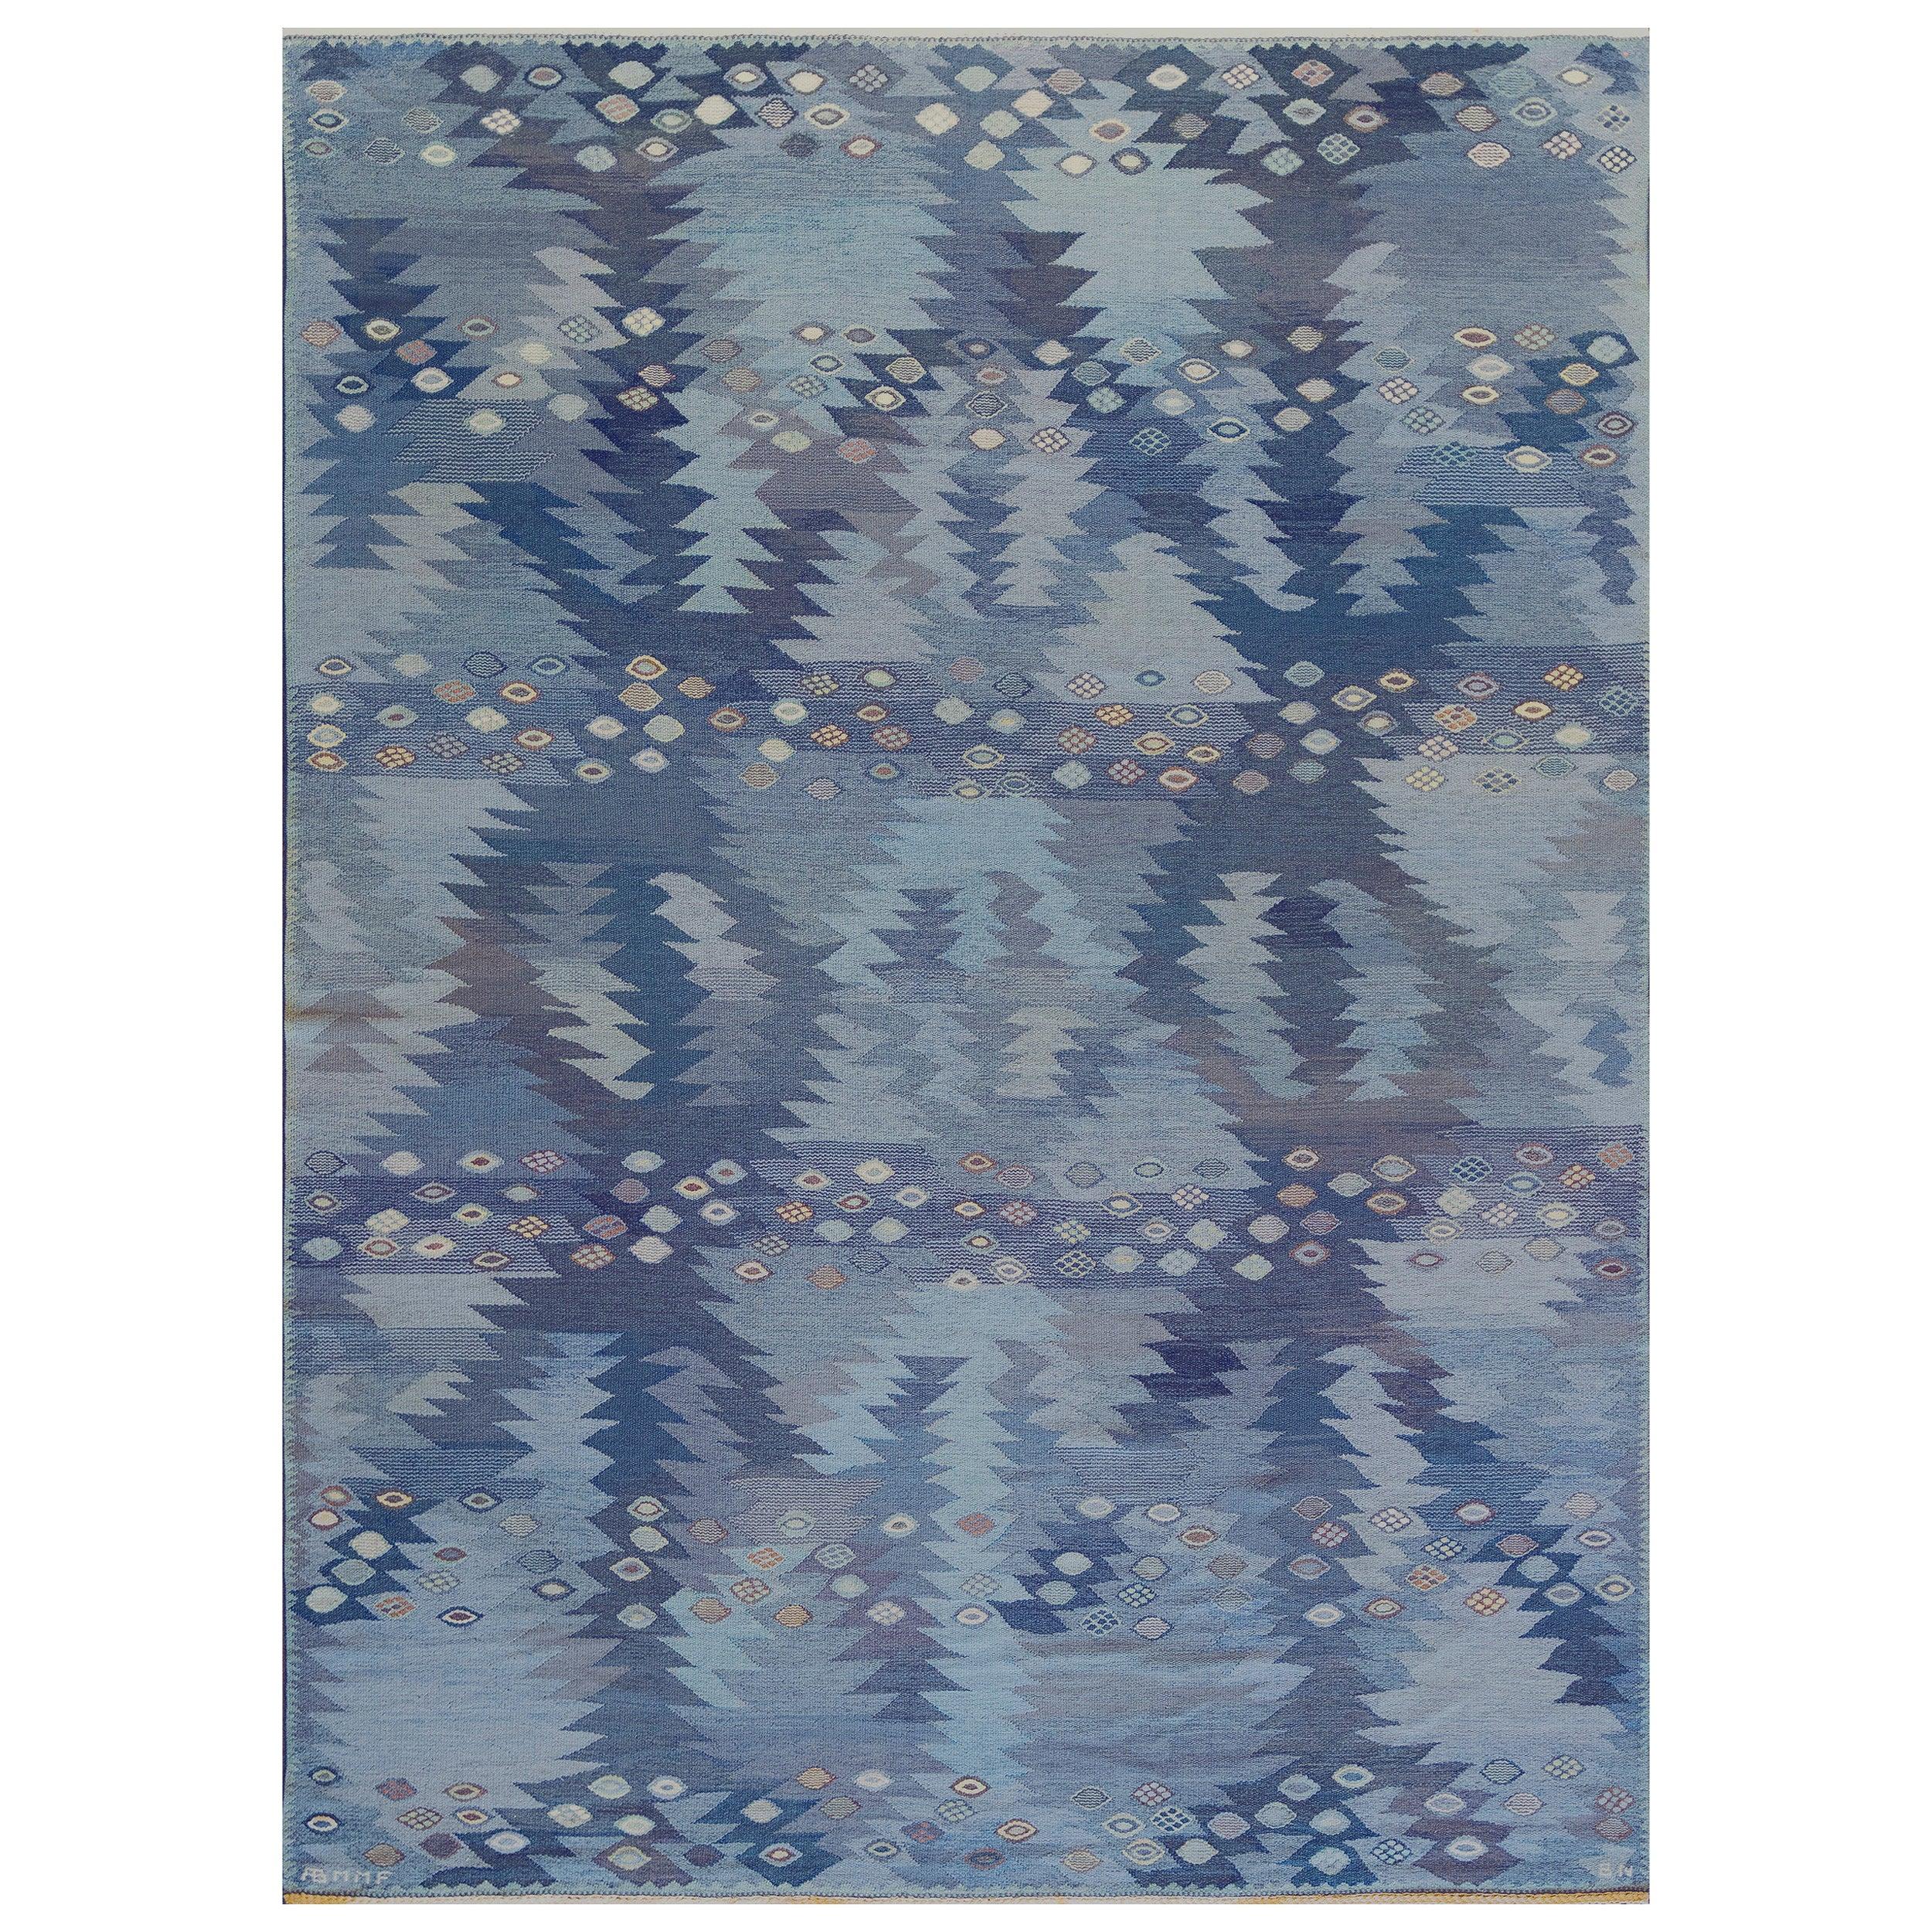 Signed Midcentury Handwoven Wool Swedish Rug